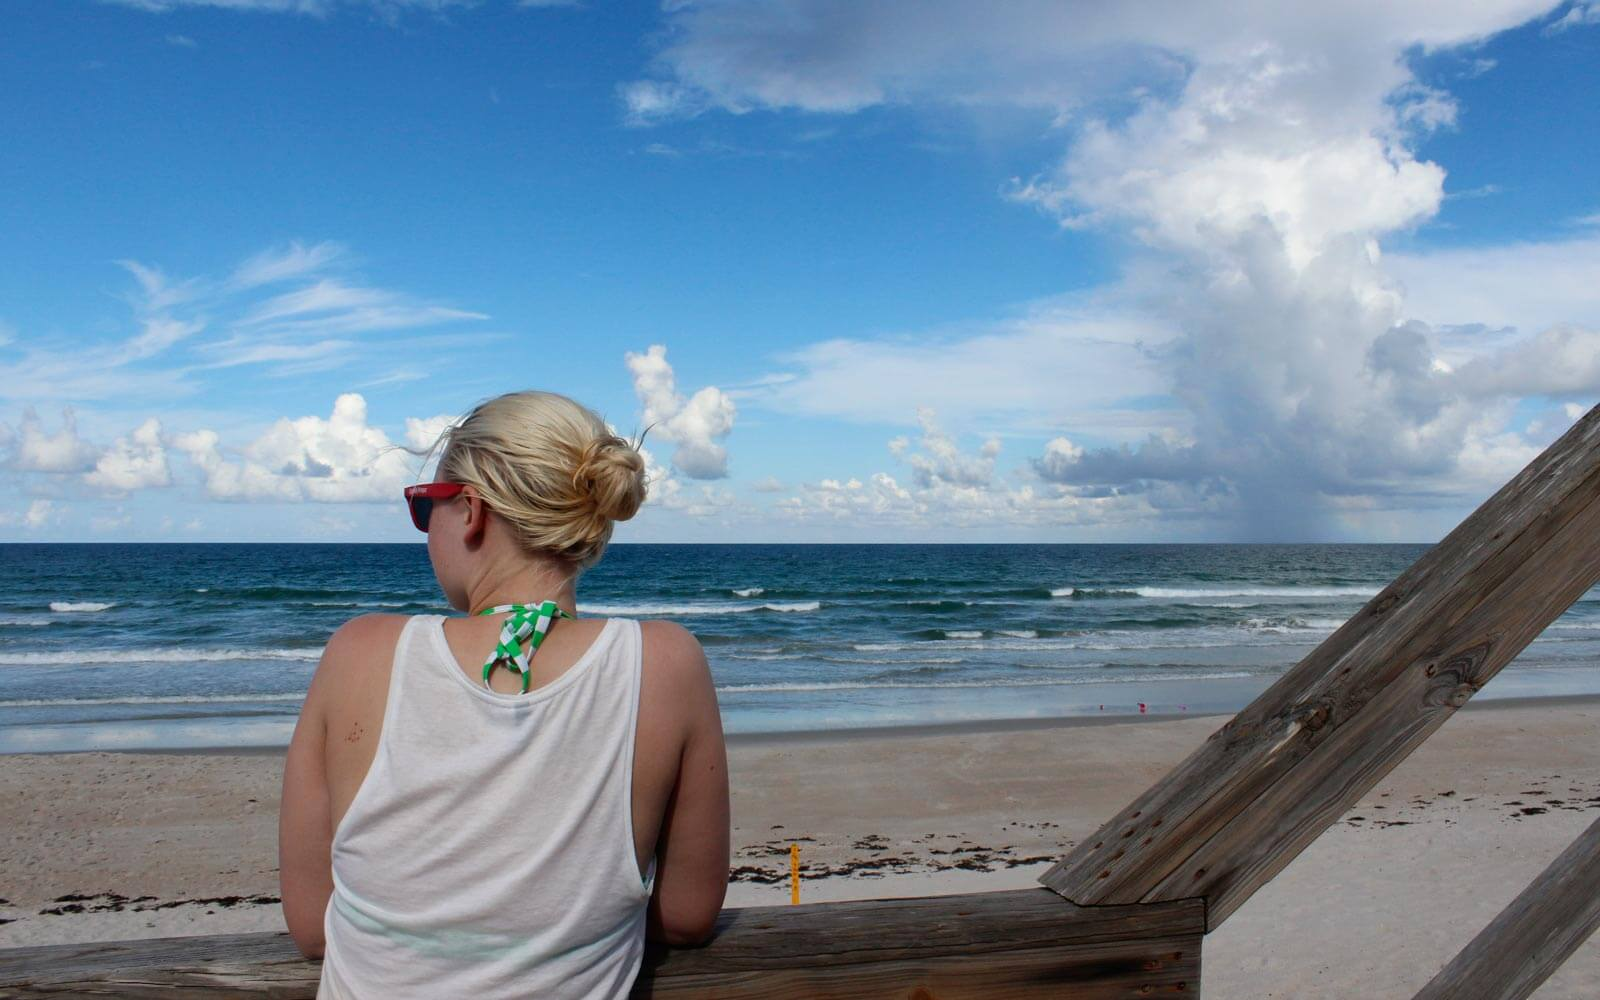 Franziska am Strand in Florida